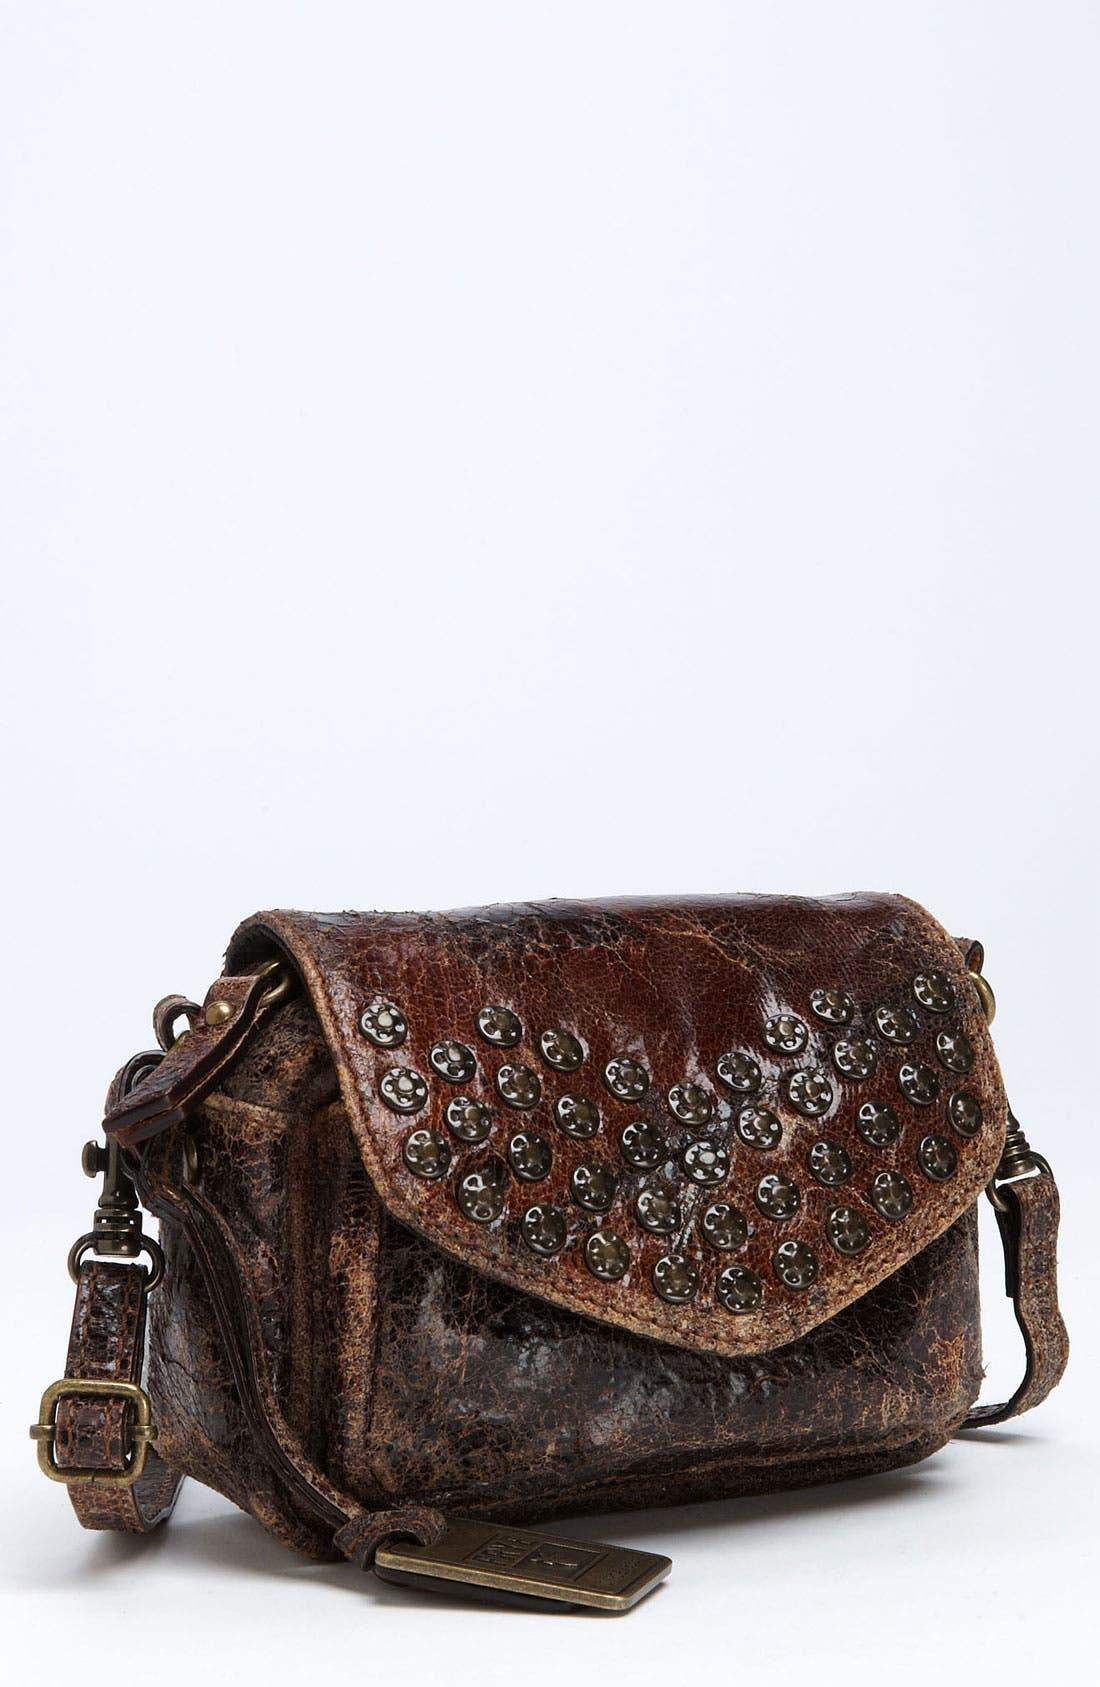 Alternate Image 1 Selected - Frye 'Vintage Brooke - Mini' Crossbody Bag